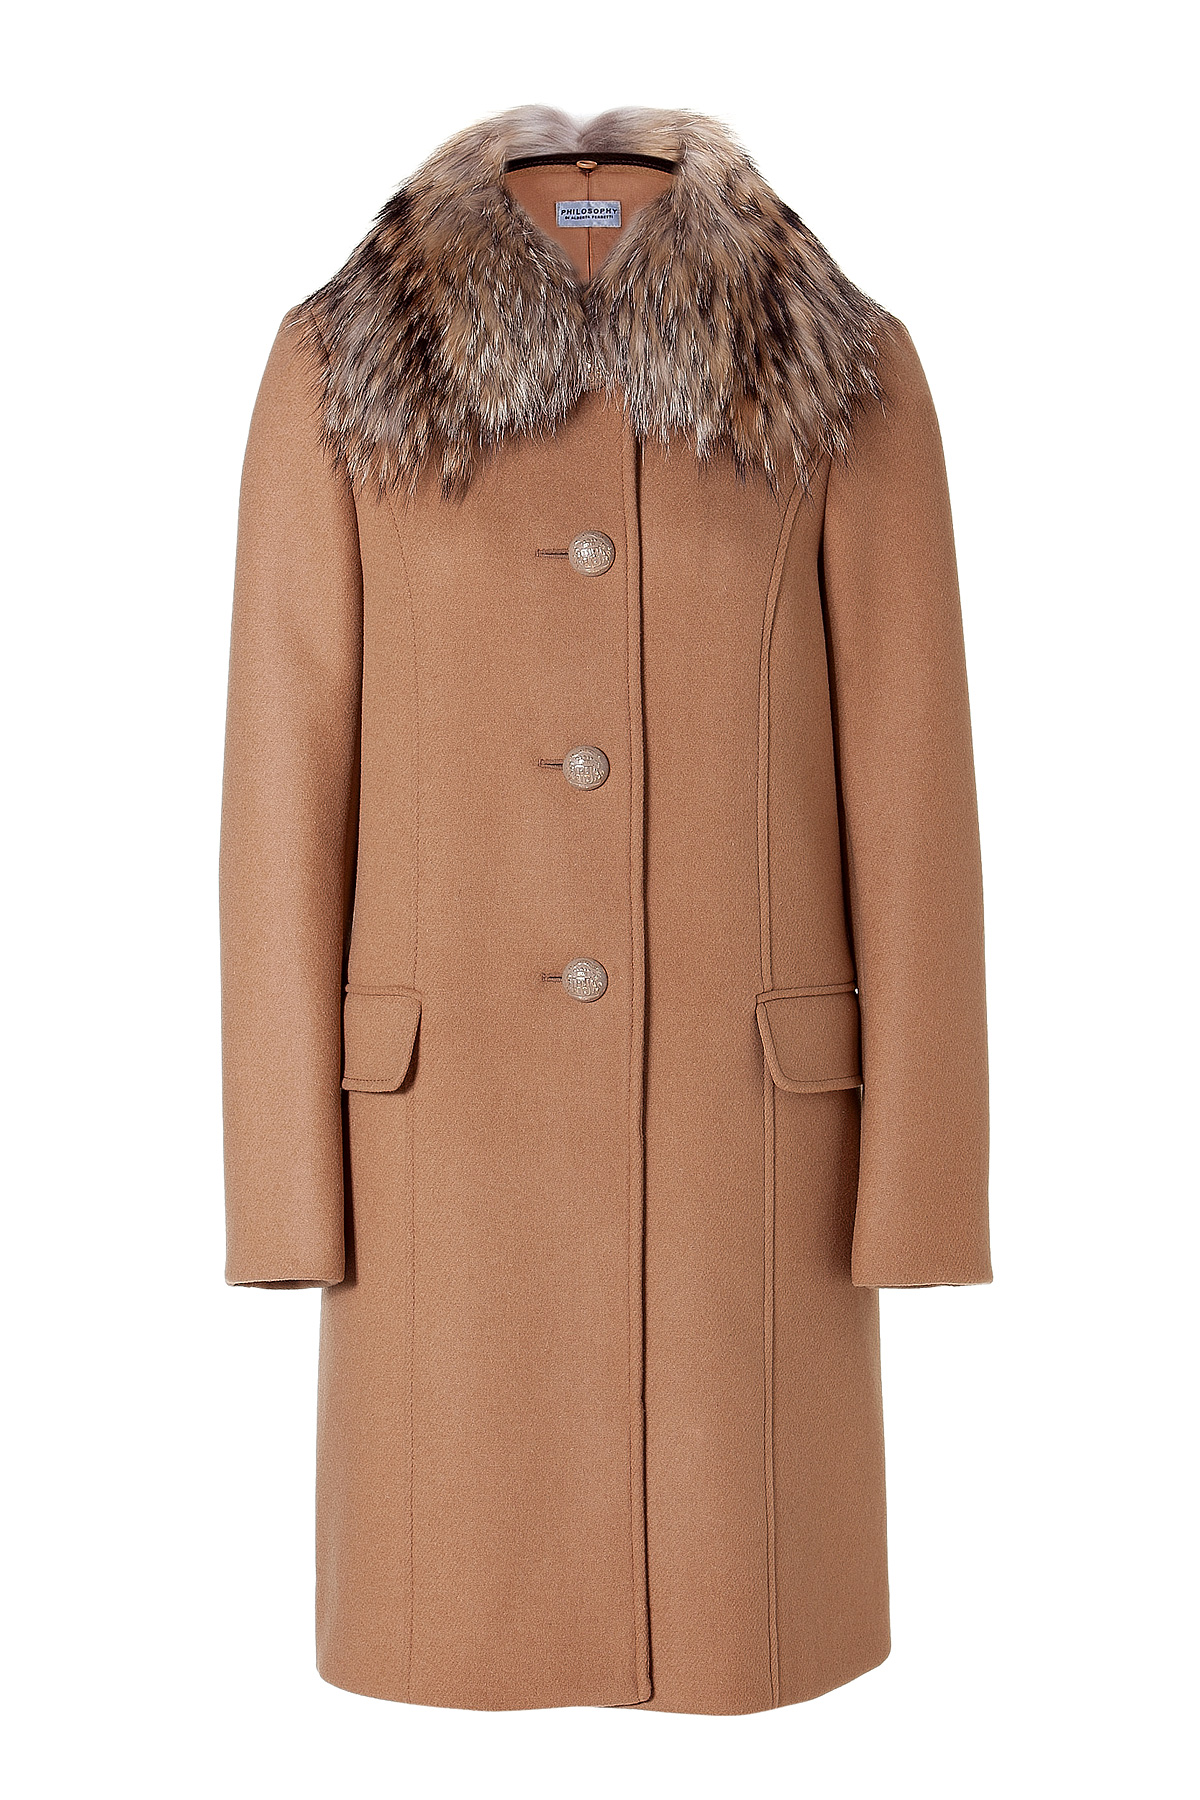 Lyst - Philosophy di Alberta Ferretti Camel Wool Coat With Fur ... 2d3fdee87